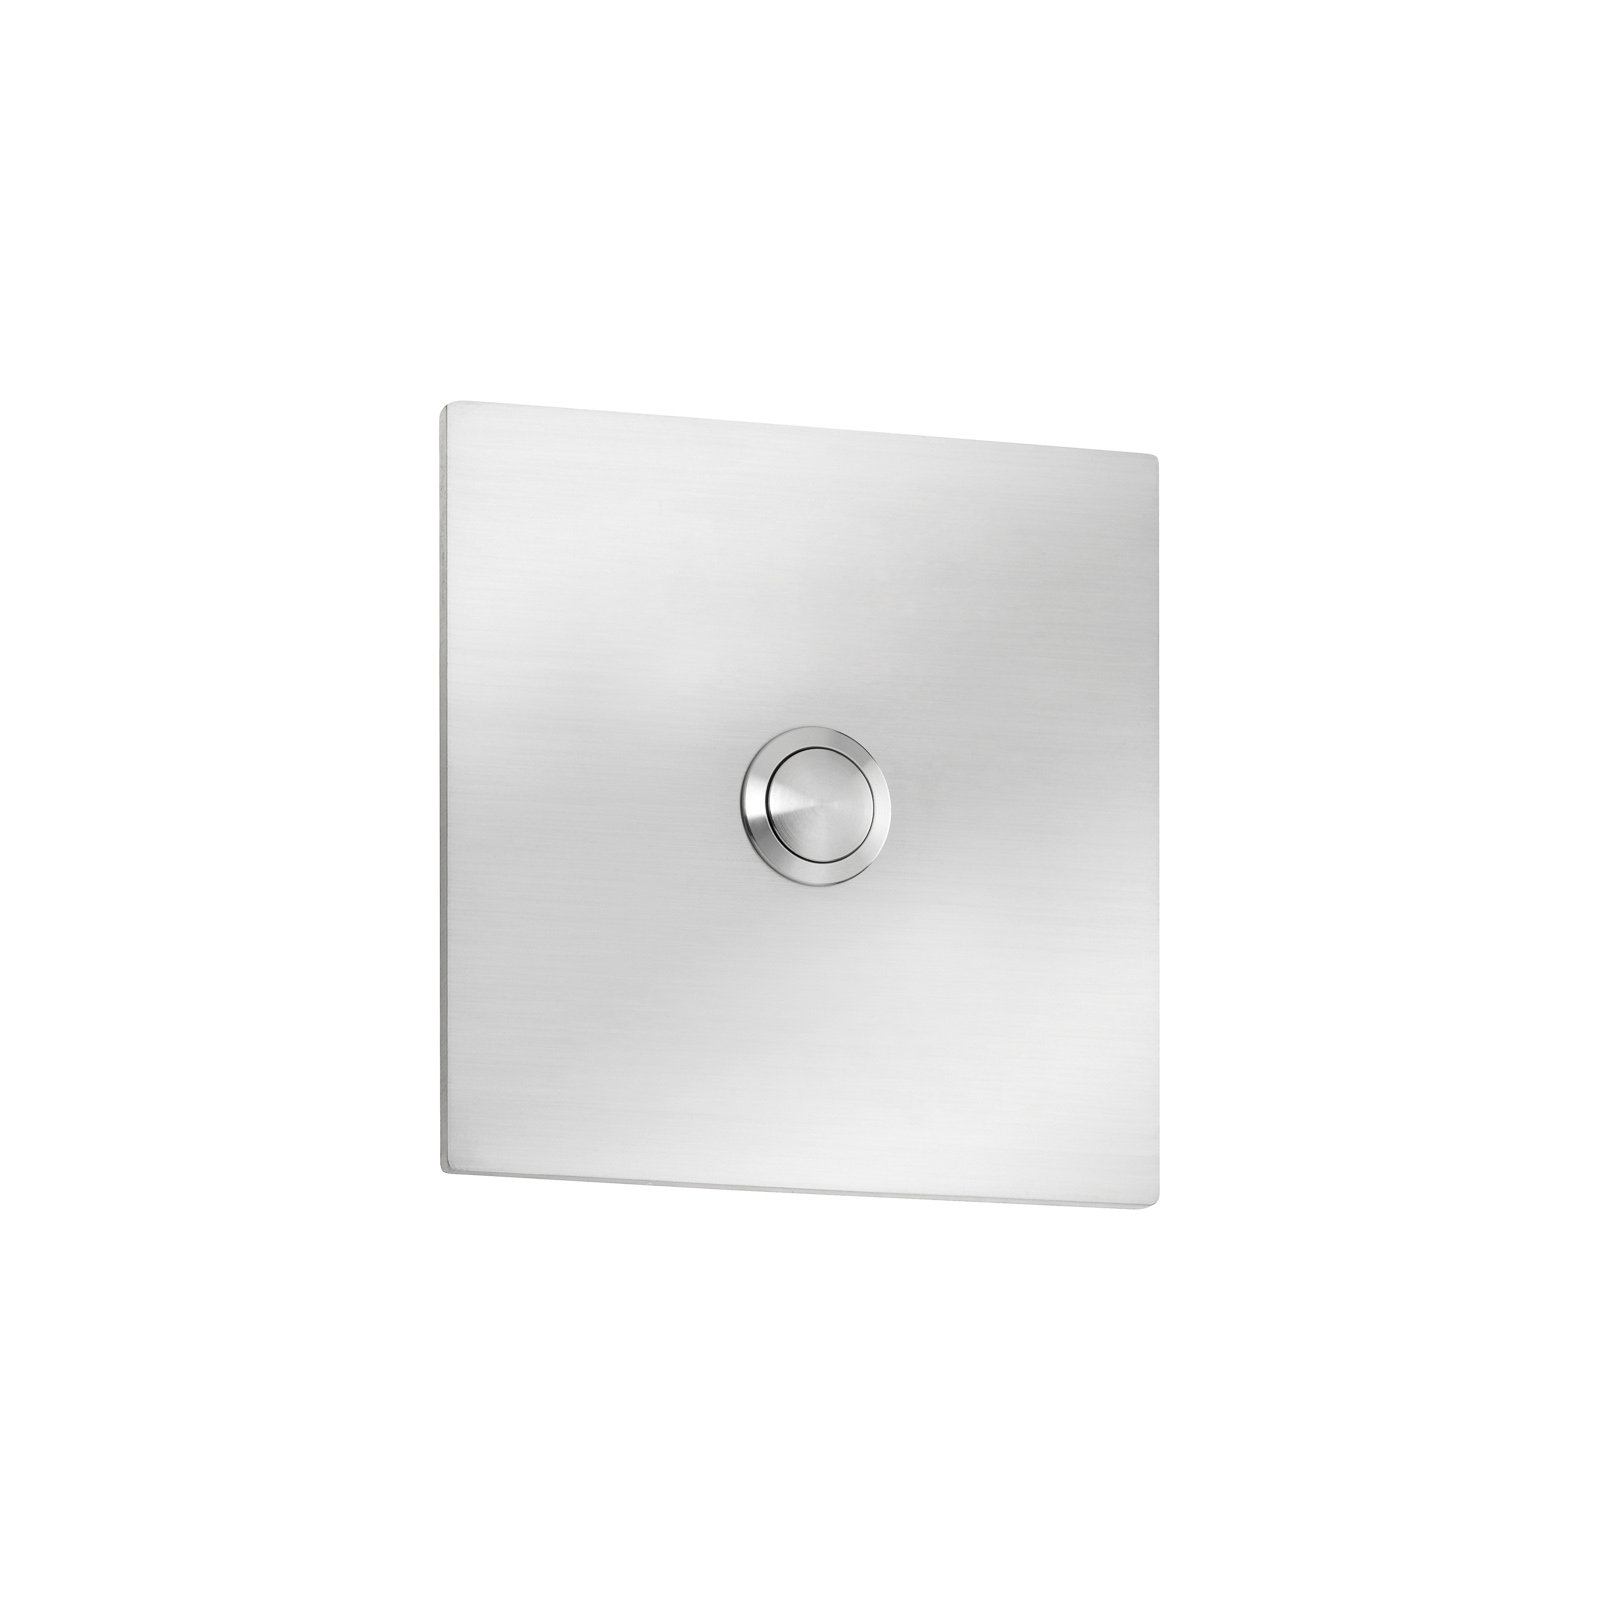 Jednoduchá zvonková deska čtverec